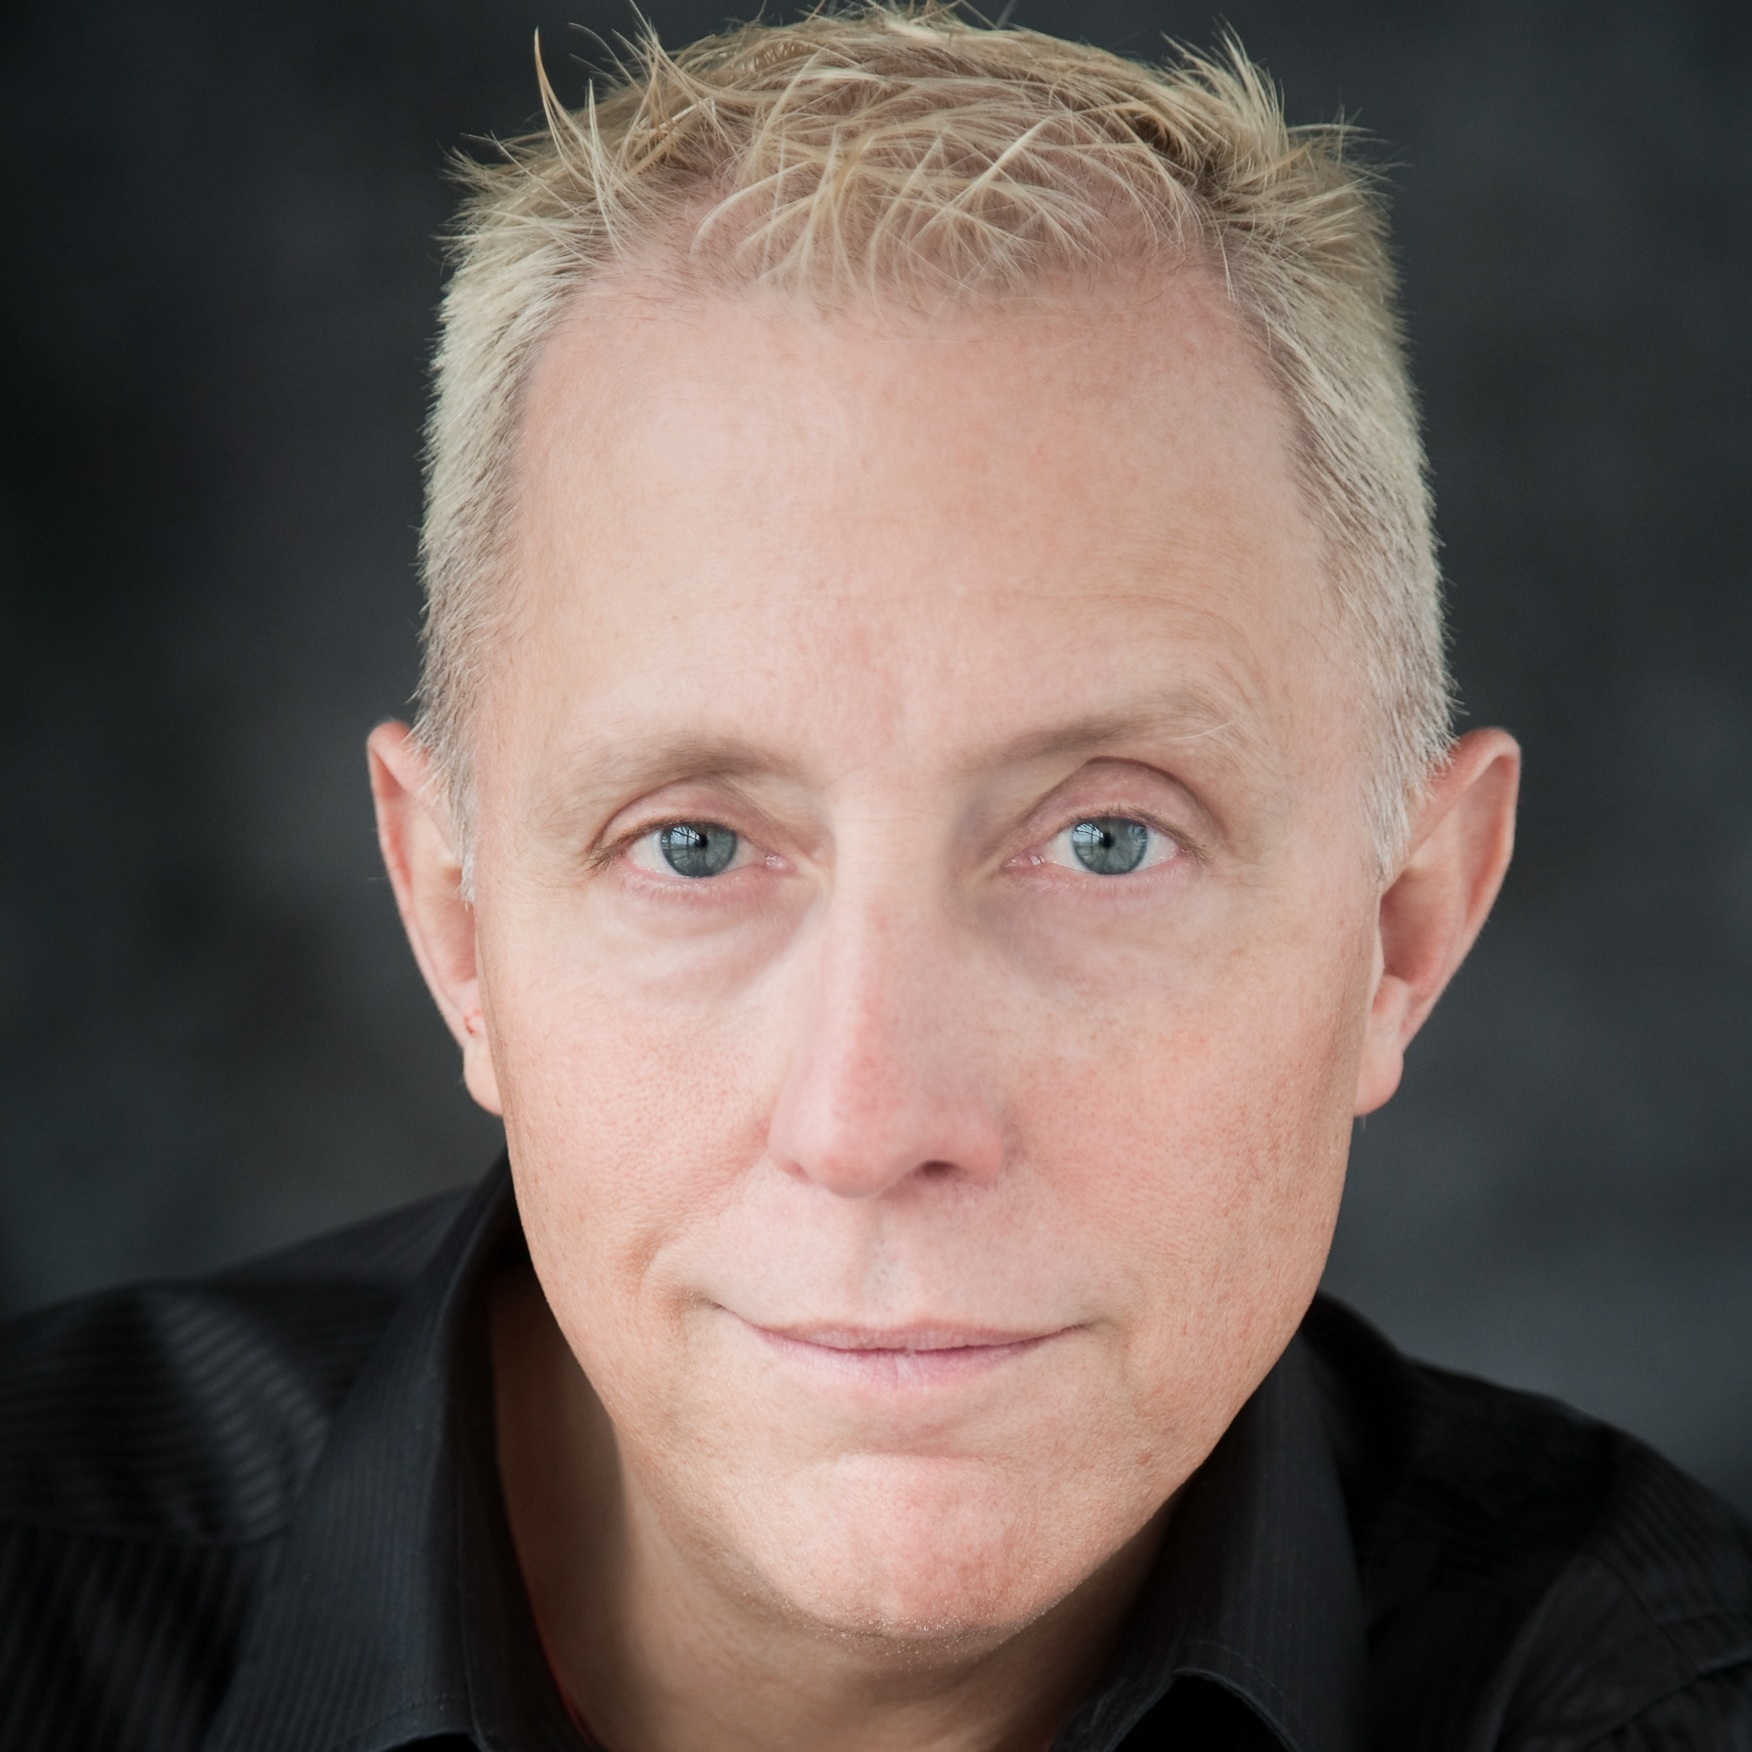 JEFFREY HUARD - MUSIC DIRECTOR